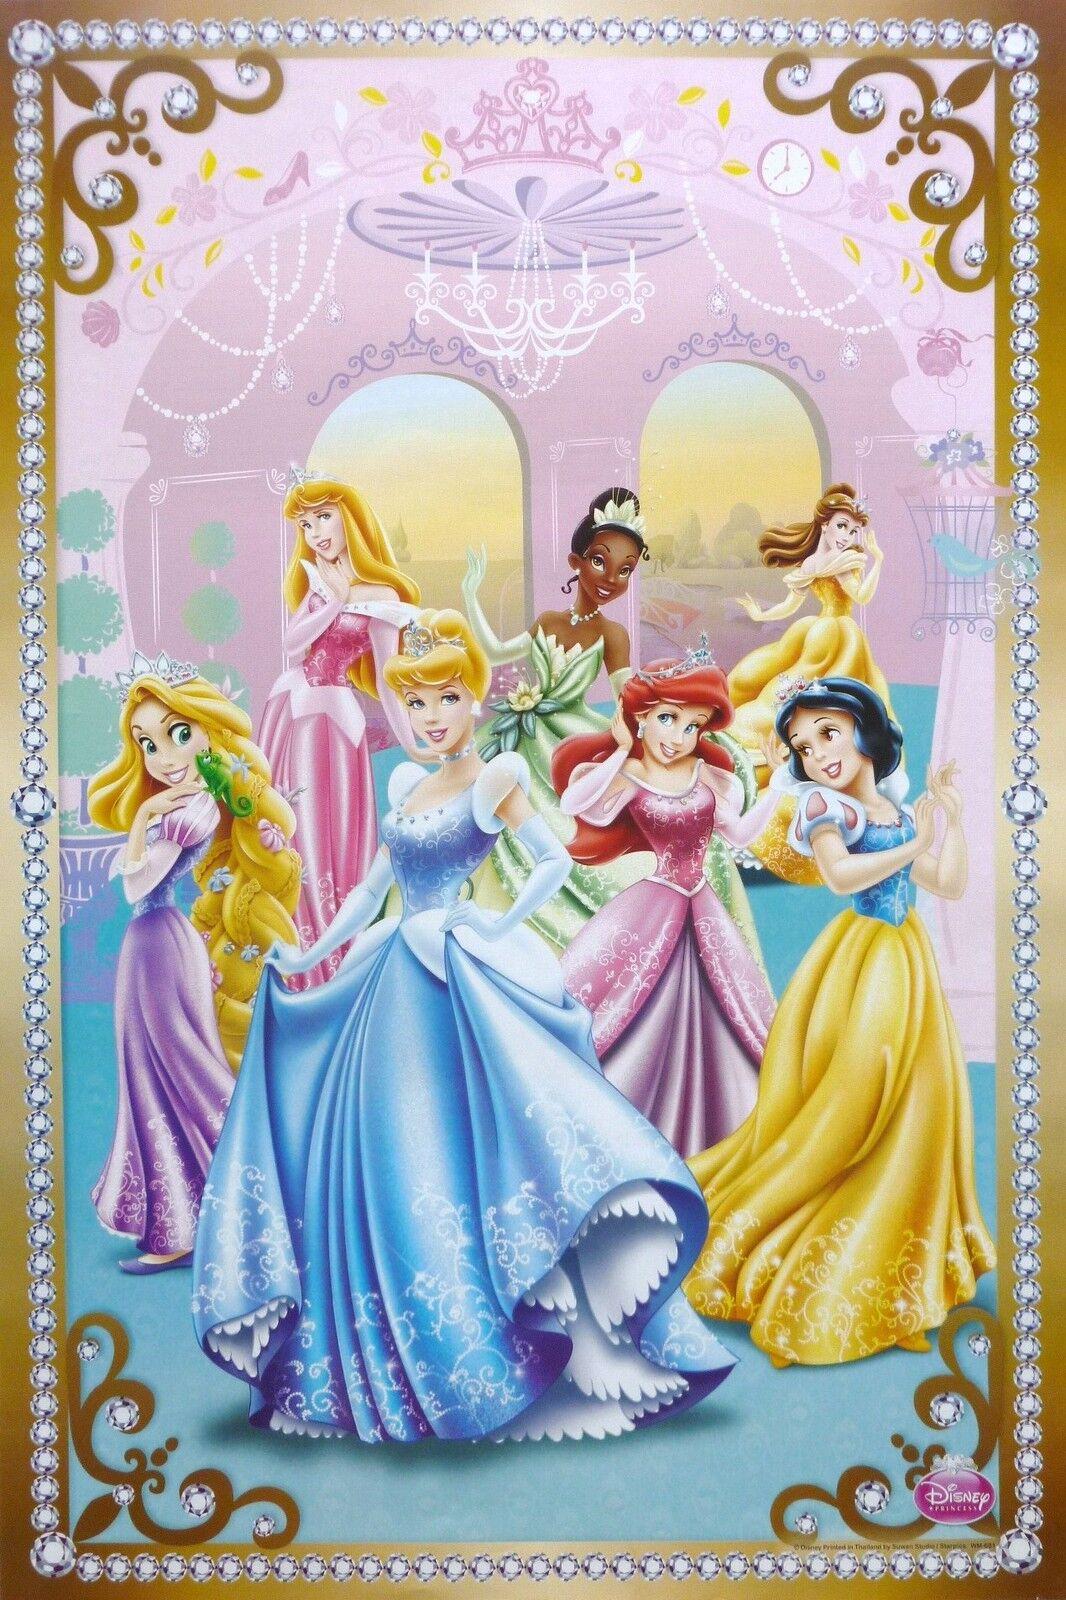 disney princess poster by - photo #20